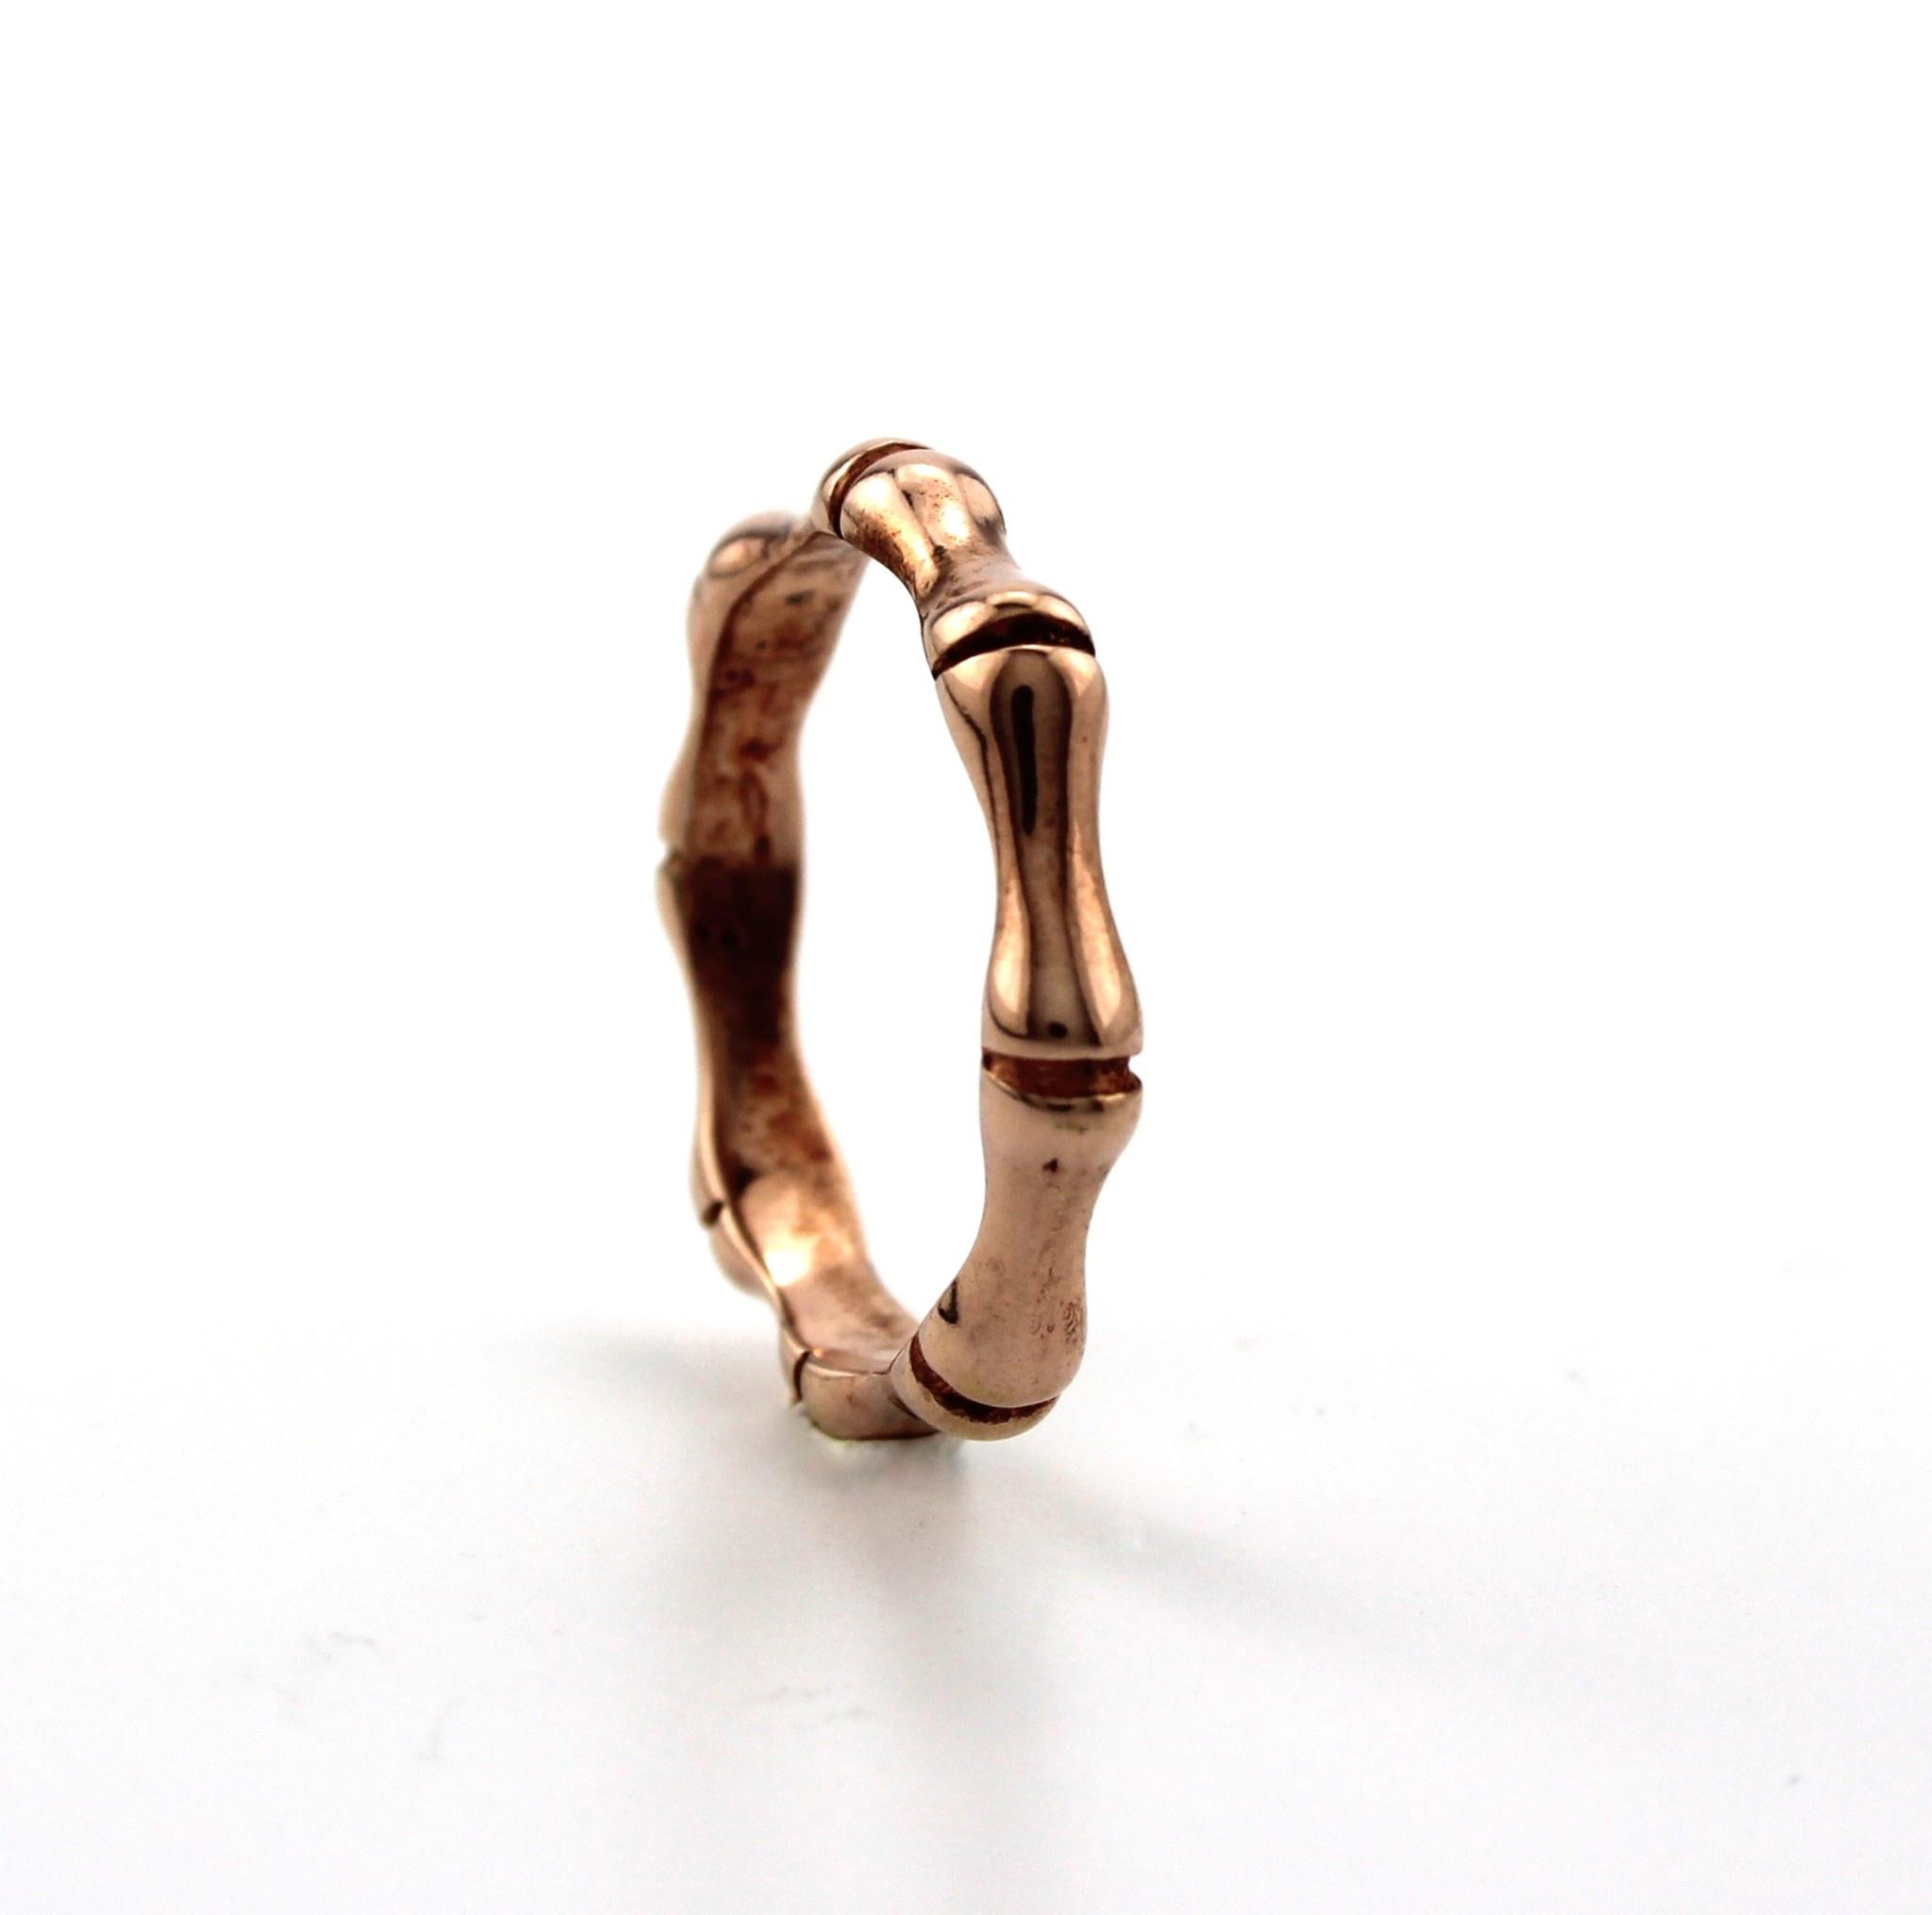 Dji Dji, Zilveren ring, Bamboo Rosé.